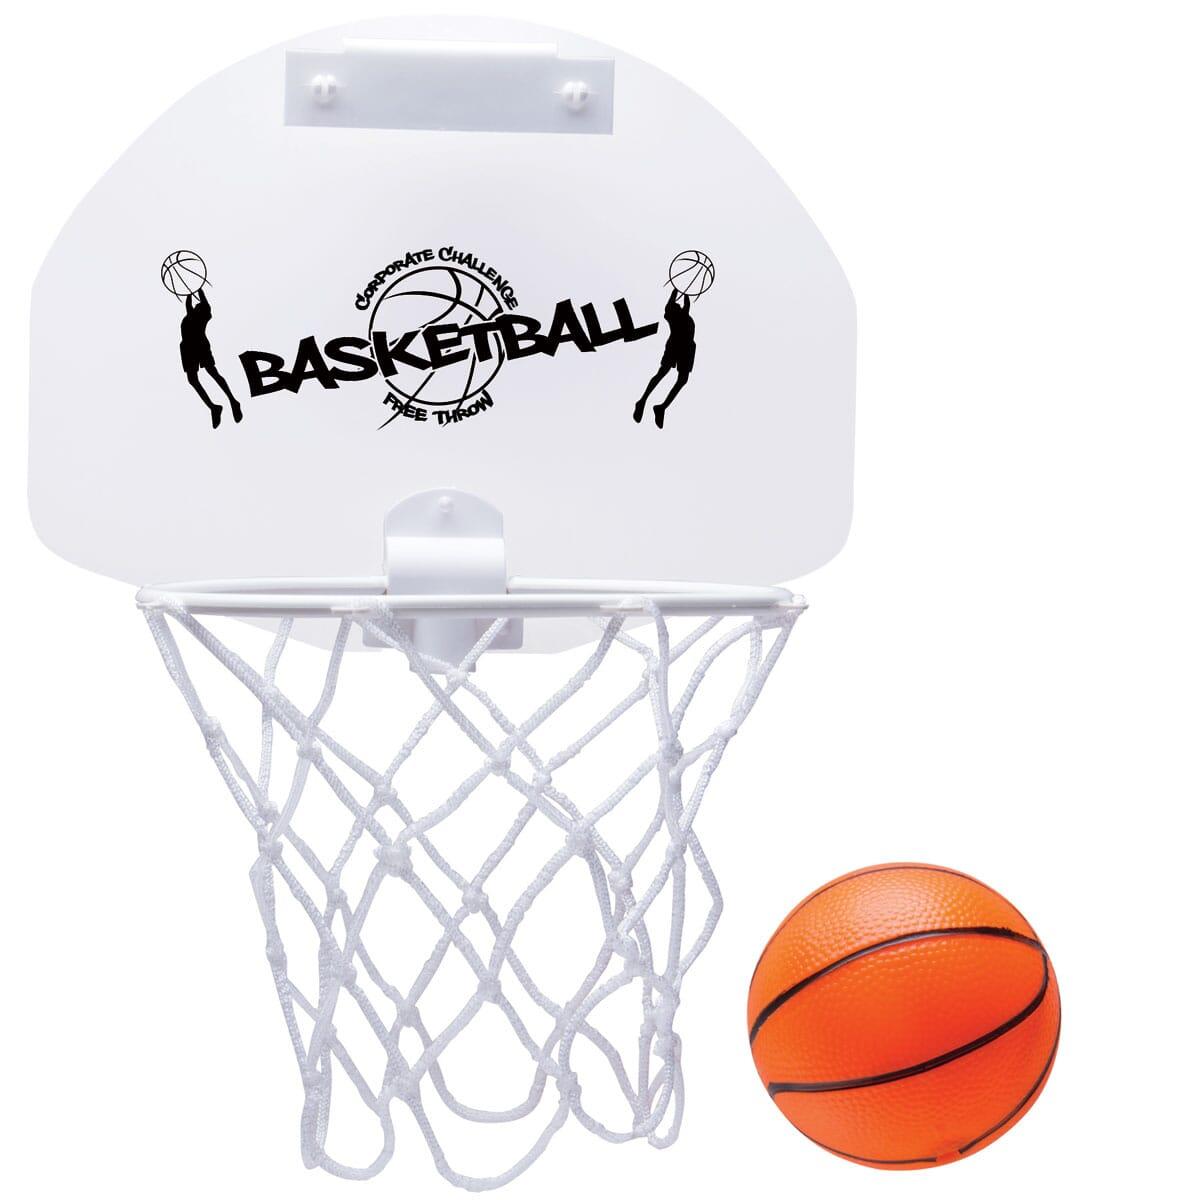 White basketball hoop with black logo alongside small orange basketball